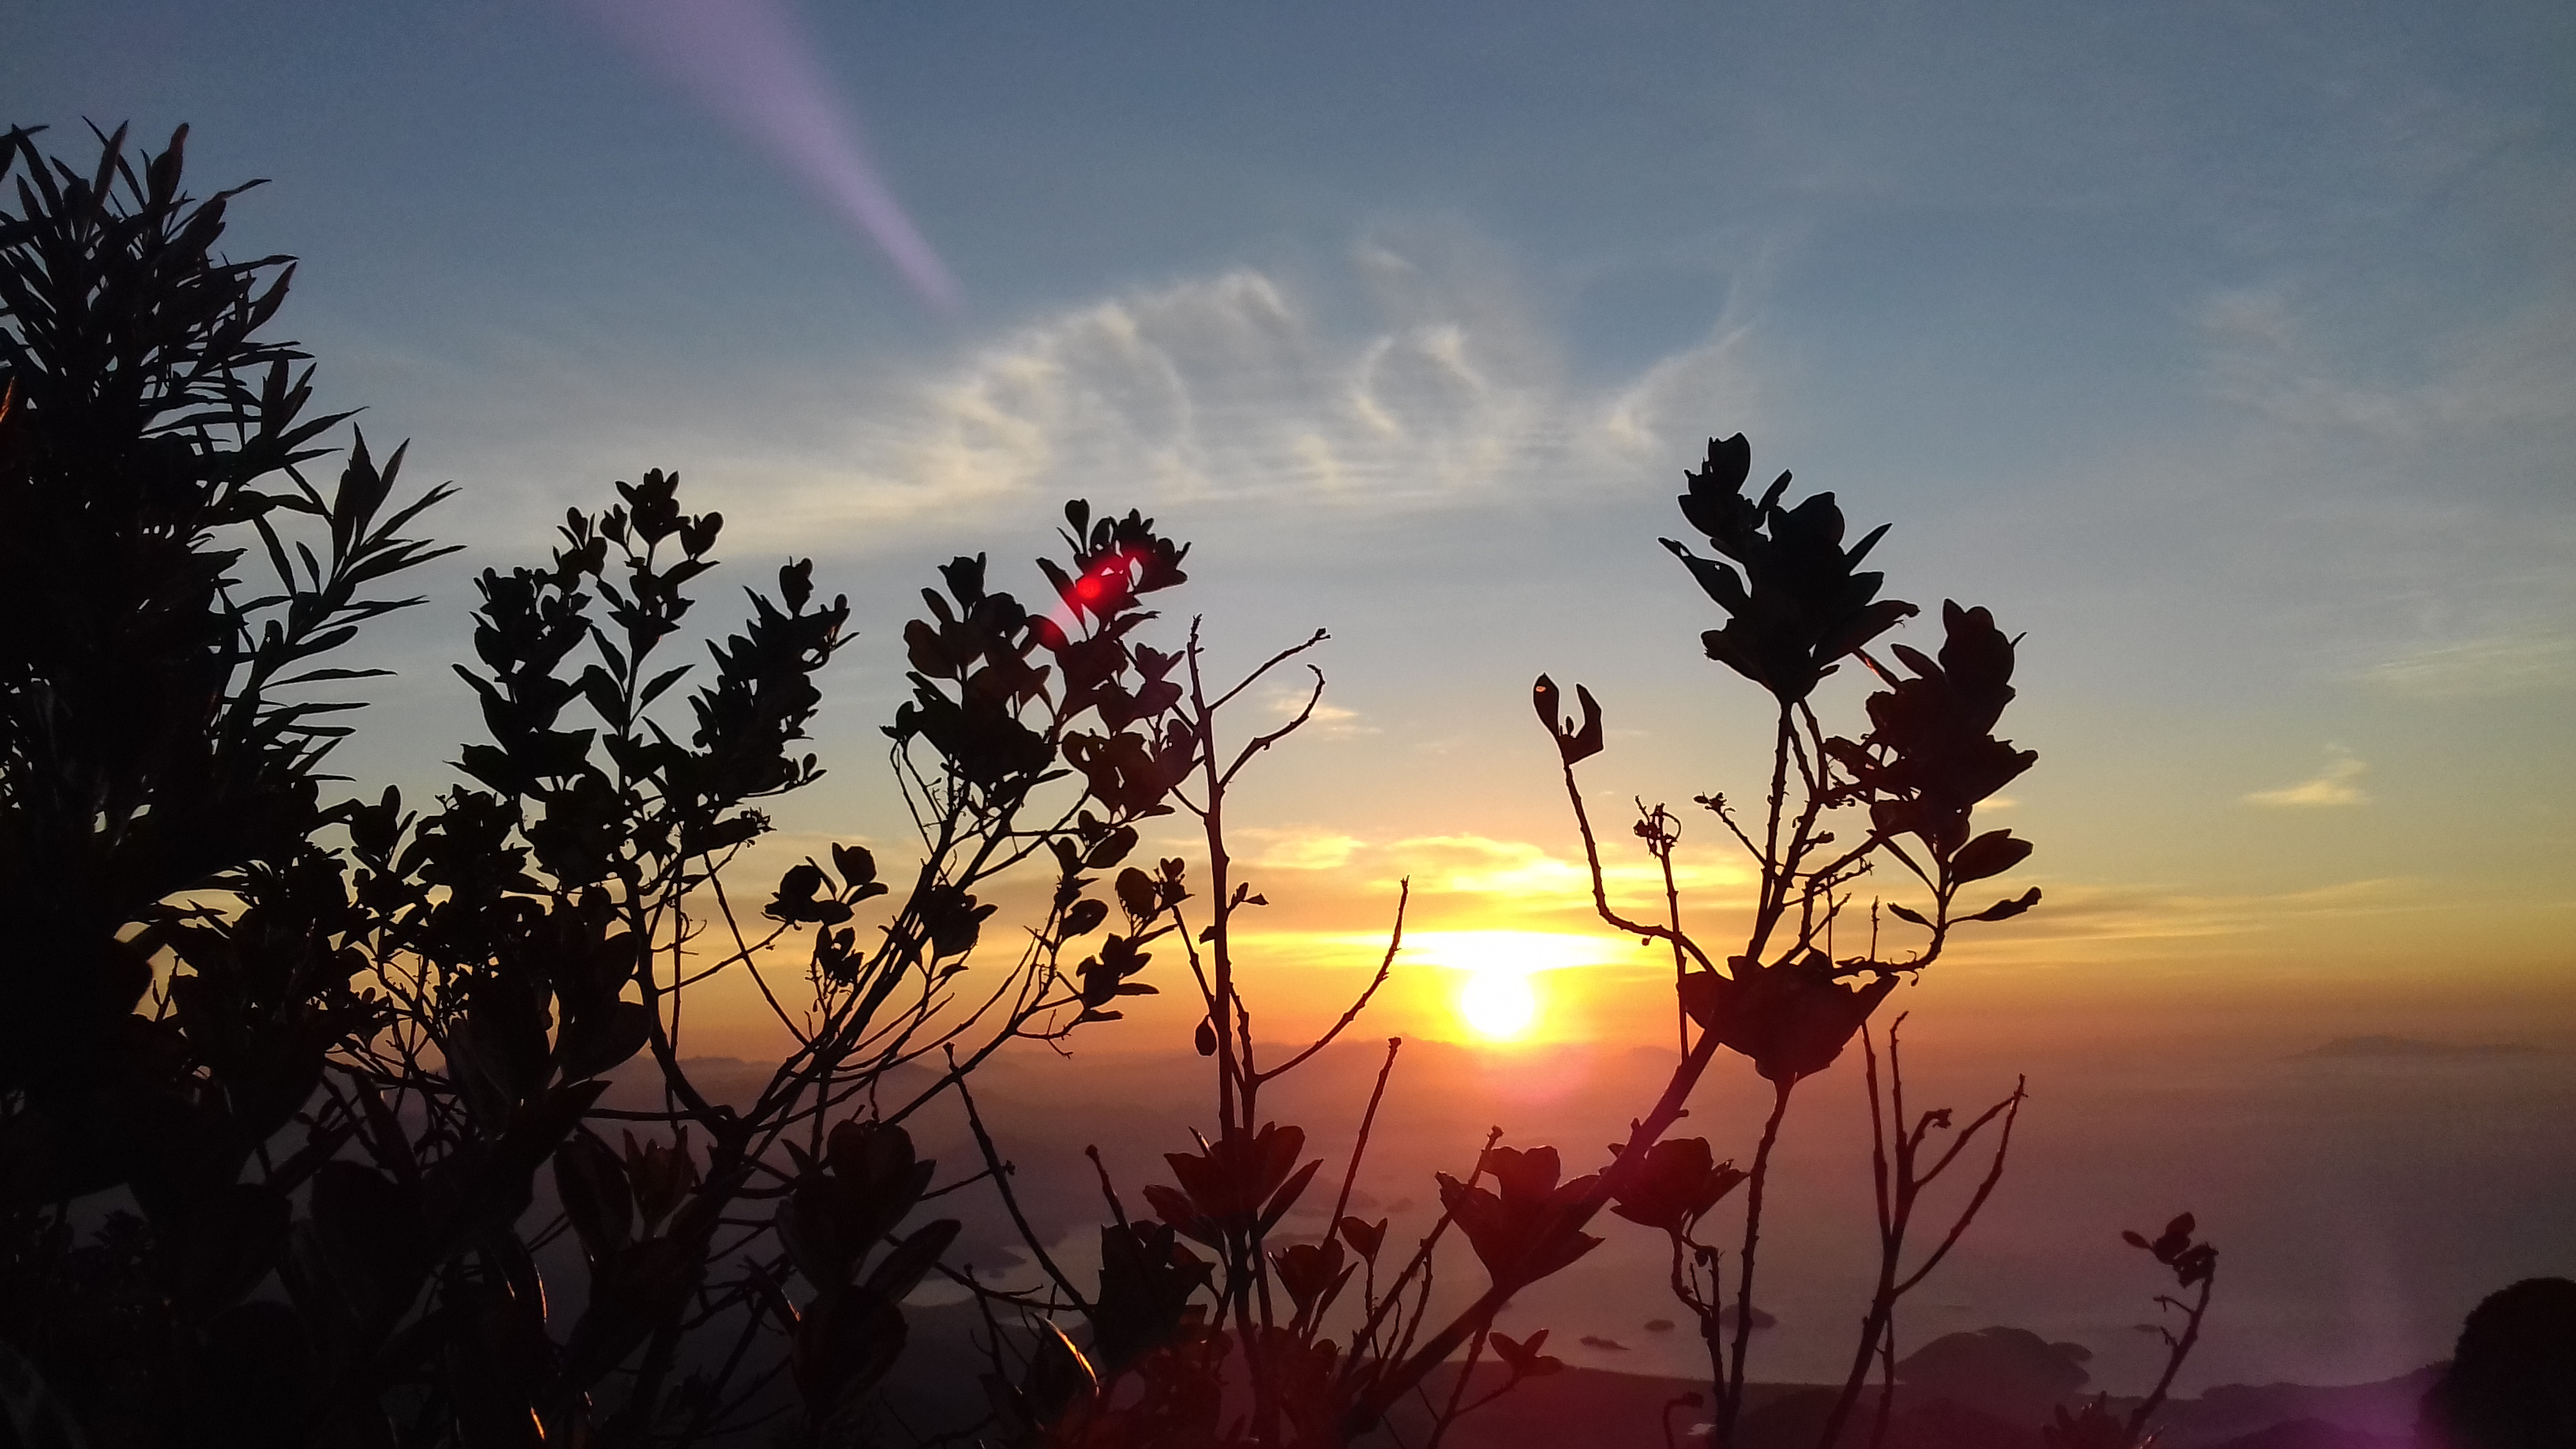 File:Nascer do Sol entre plantas silvestres.jpg - Wikimedia Commons